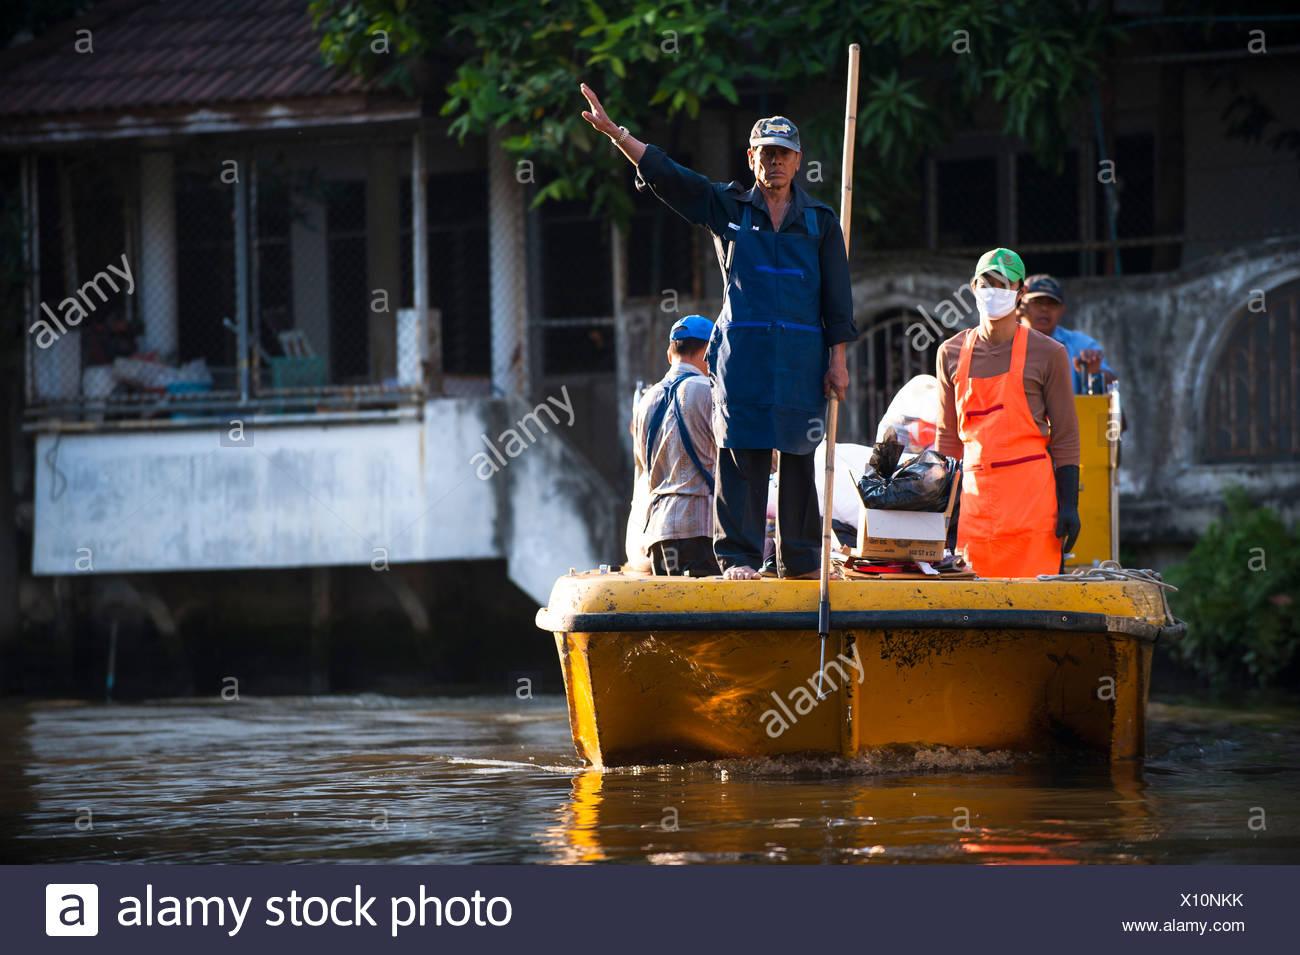 Rubbish collection, Khlong or Klong, canal, Bangkok, Thailand, Asia - Stock Image